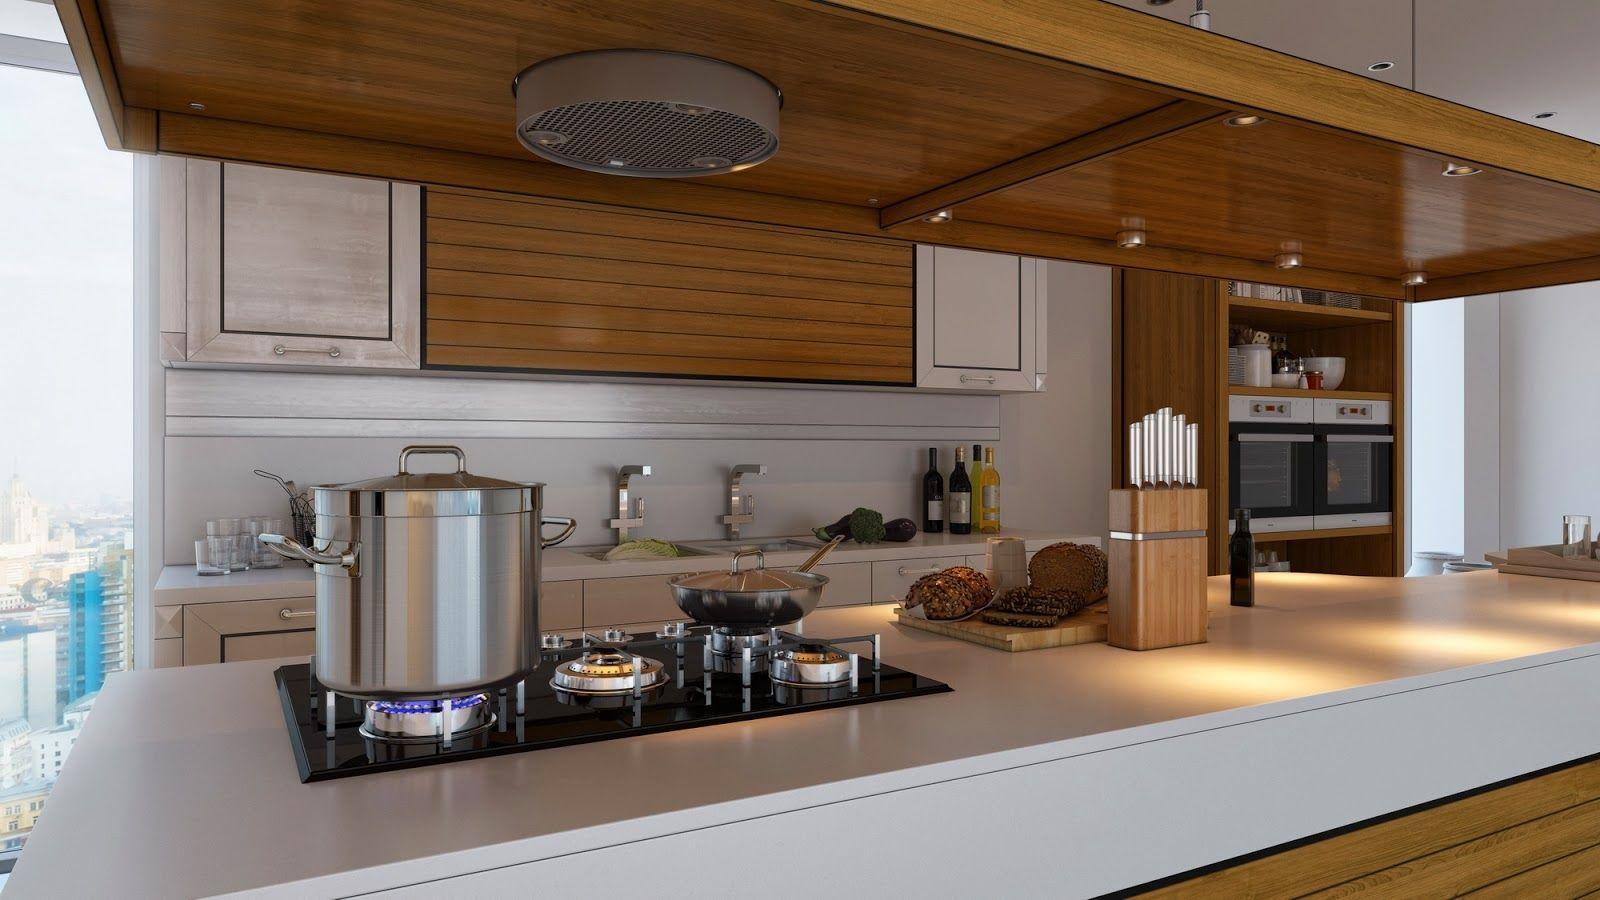 Gas Kitchen Appliances Amazing Kitchen Gas Stove Gas Kitchen Stoves On Gas Stove For Home